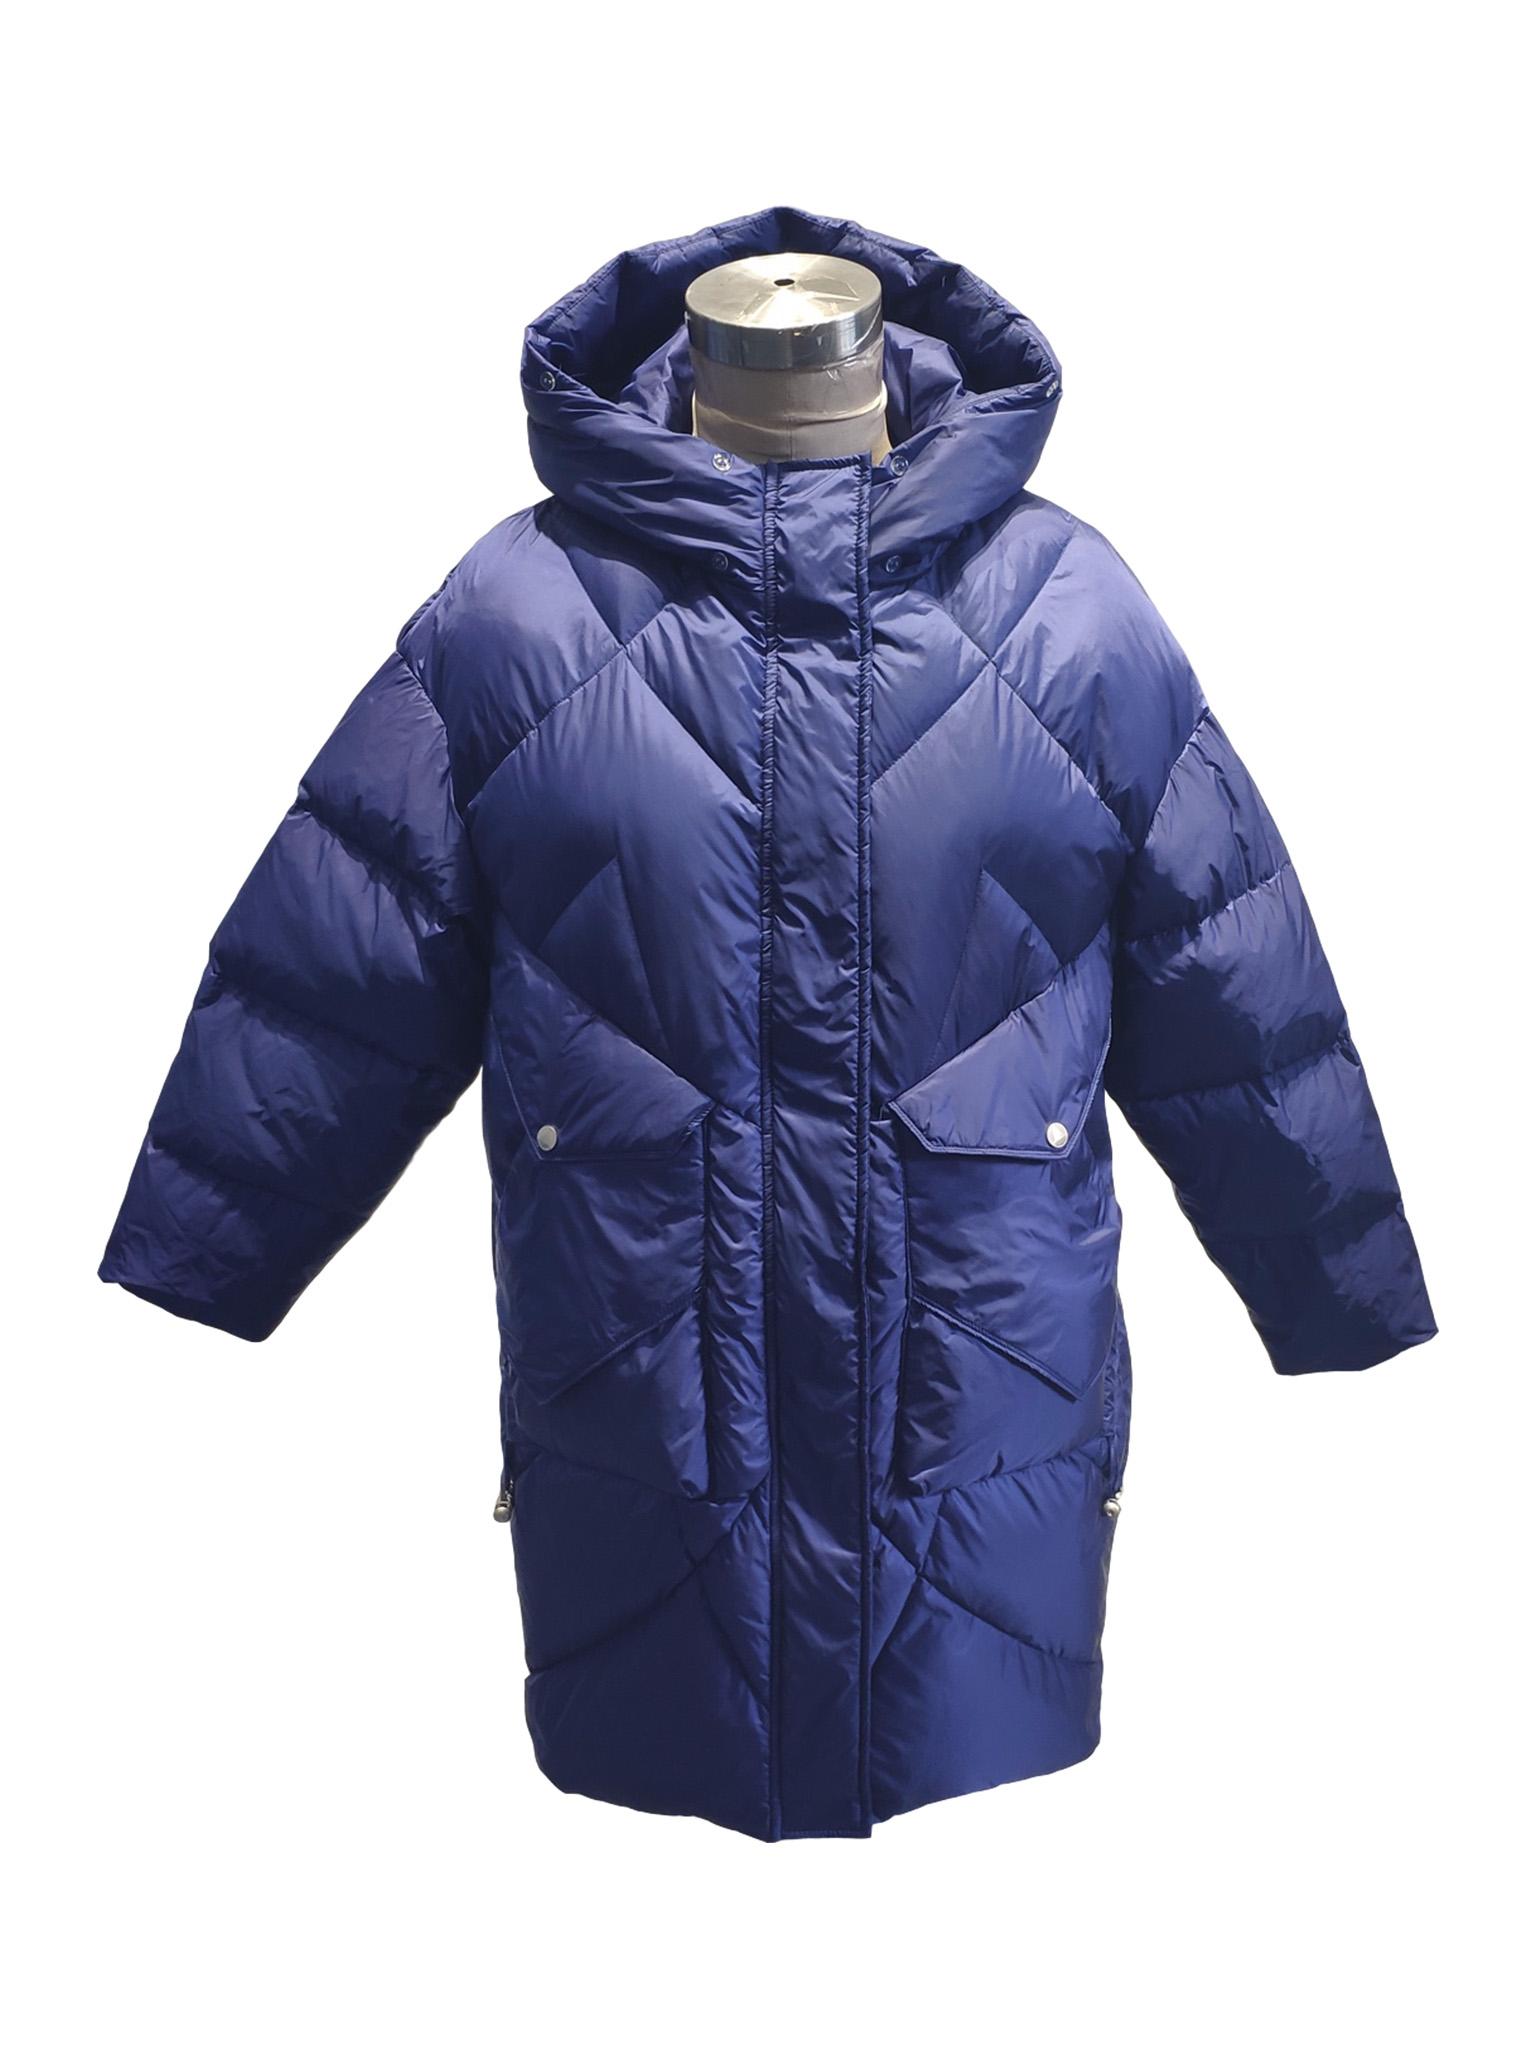 women down jacket price